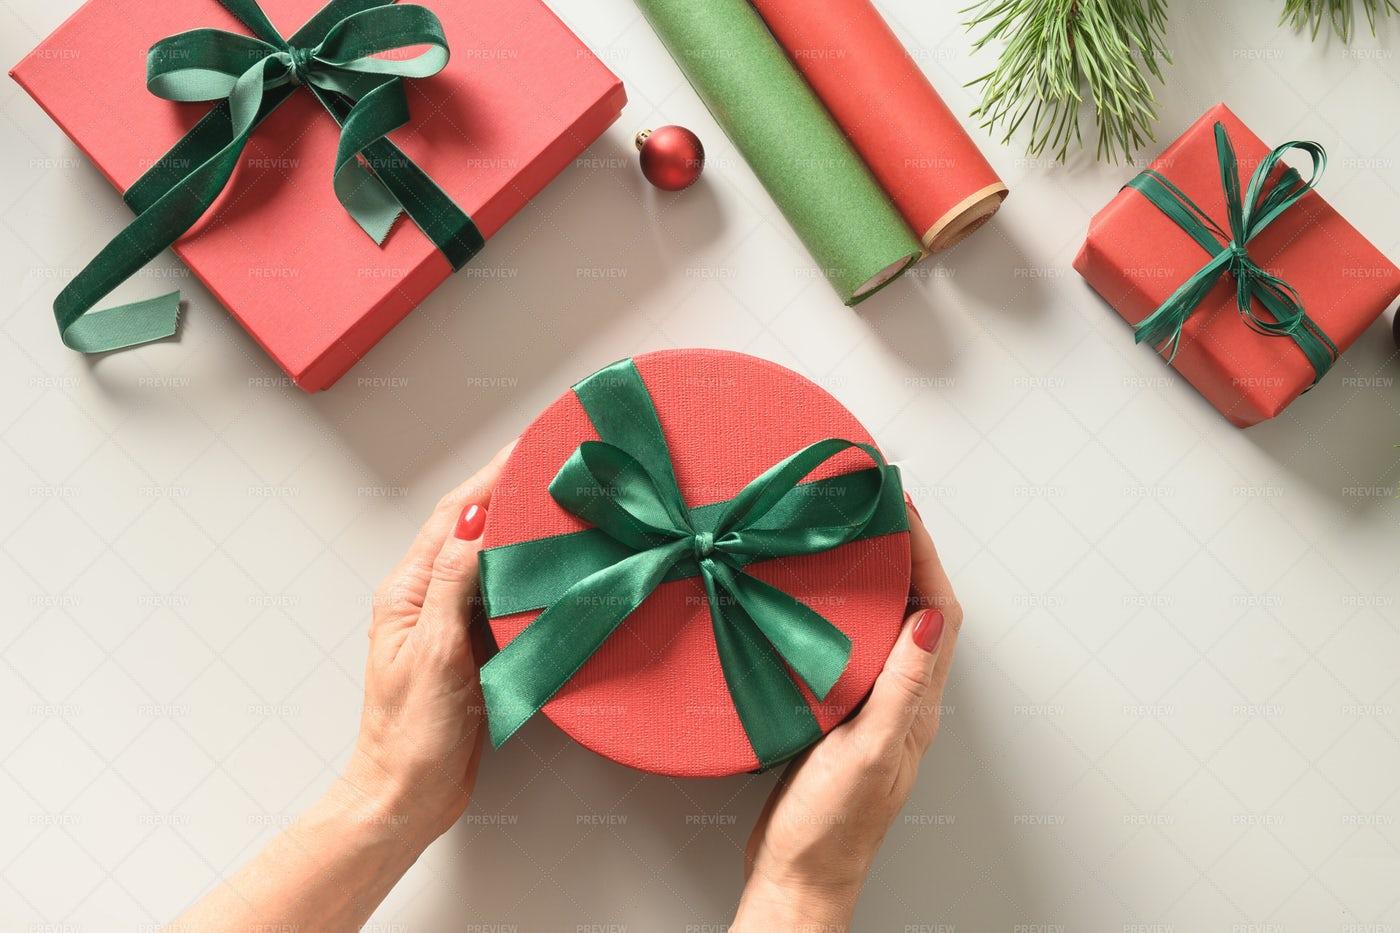 Preparing Gift Boxes For Christmas: Stock Photos